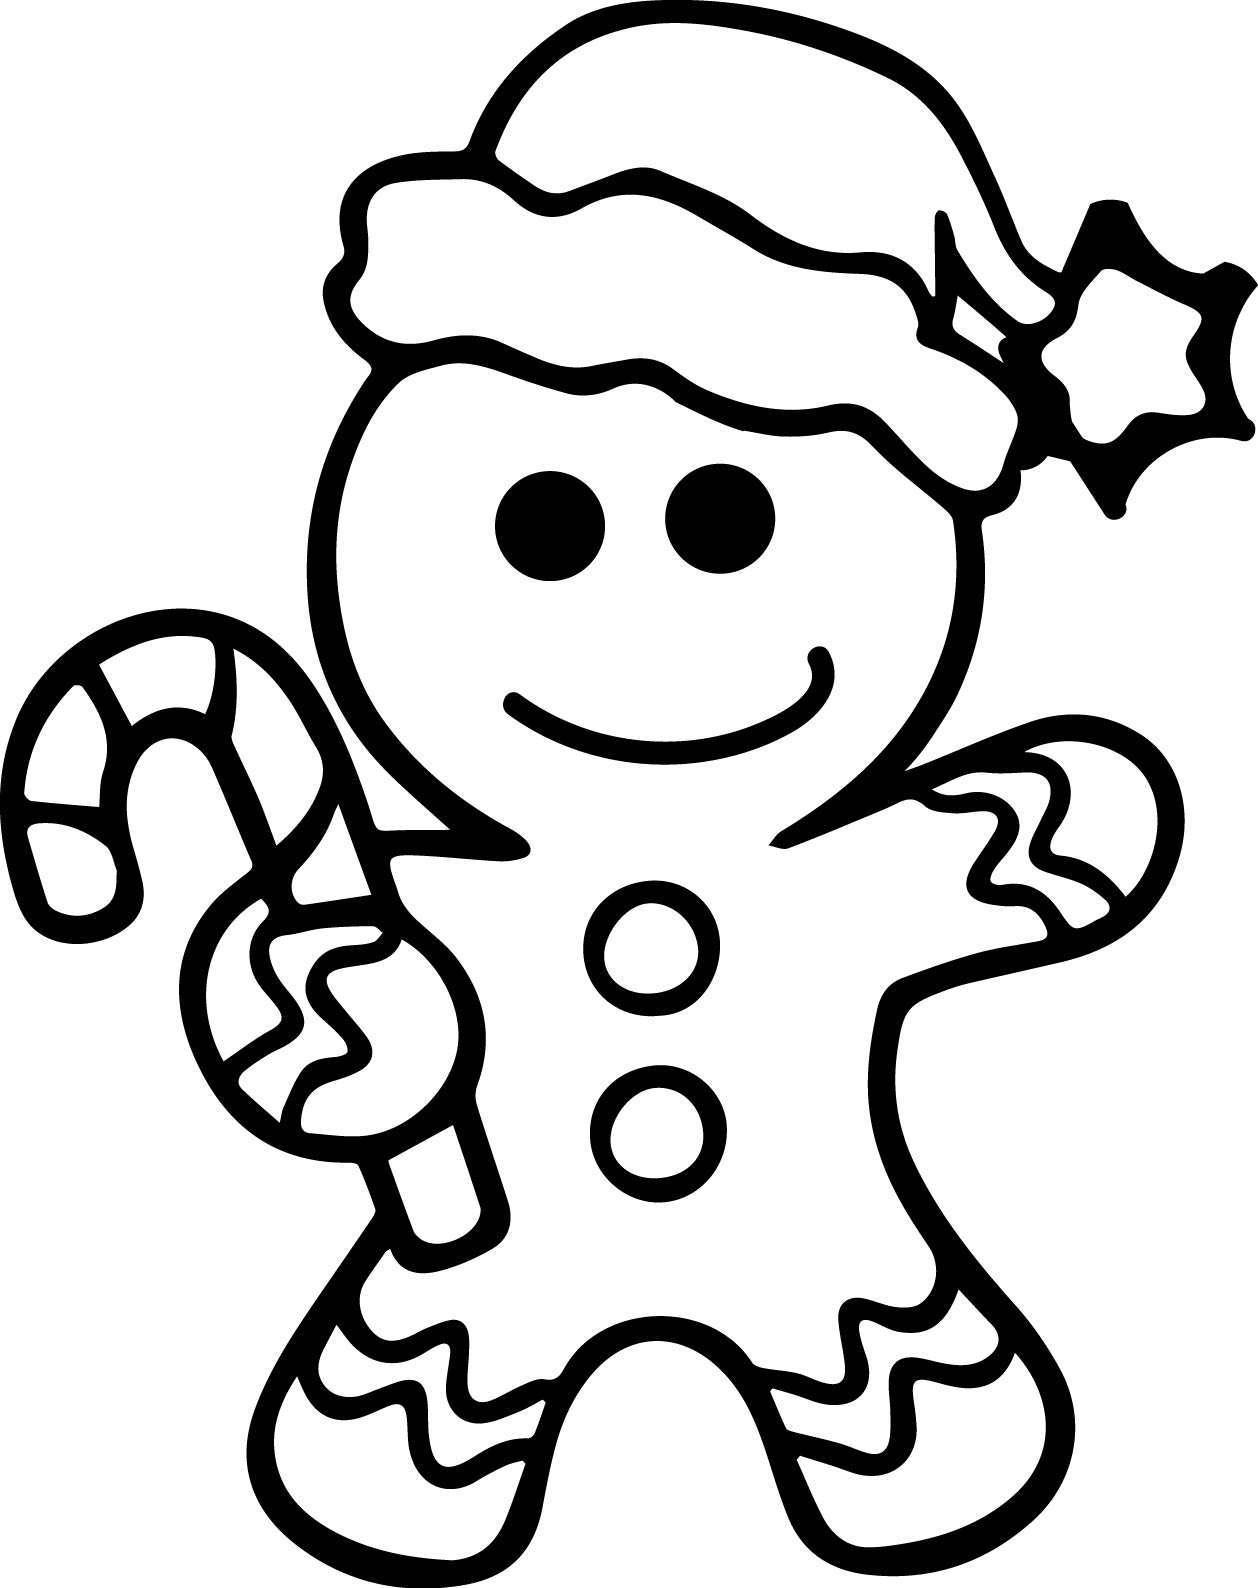 hight resolution of 1258x1588 christmas lights coloring pages printable with thomas edison light thomas edison light bulb drawing